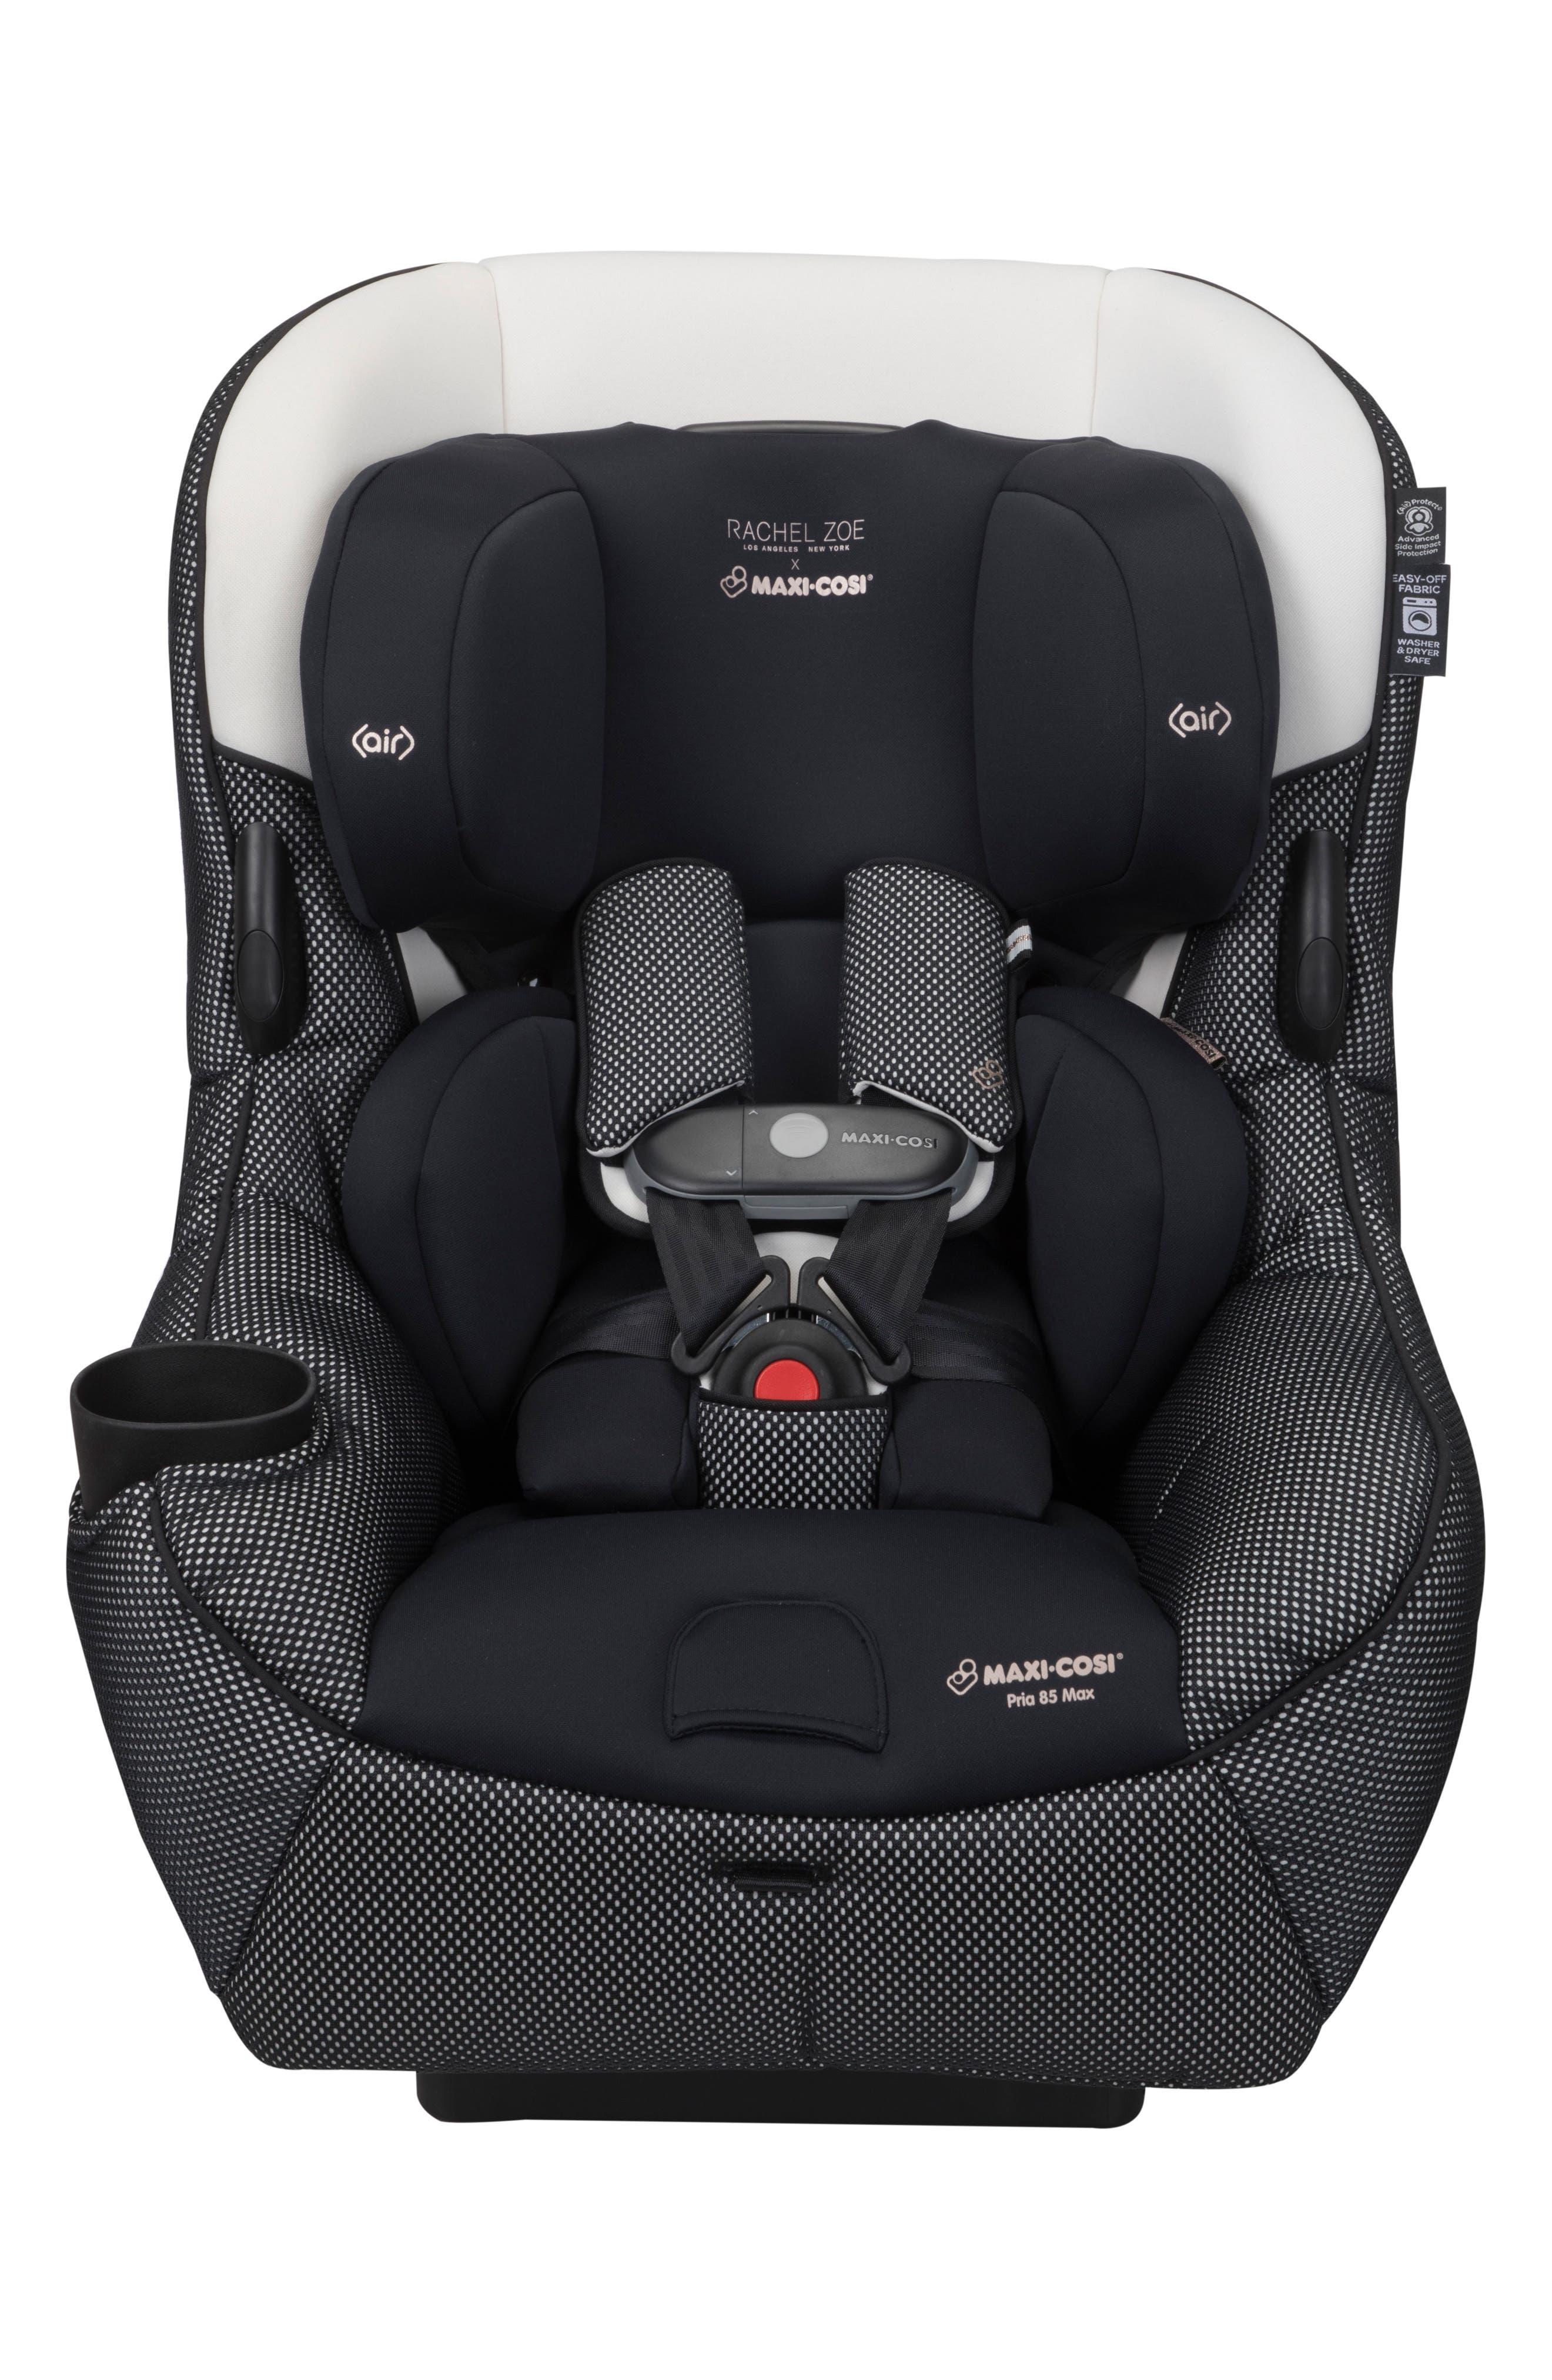 Maxi-Cosi® x Rachel Zoe Pria™ 85 Luxe Sport Max Convertible Car Seat (Nordstrom Exclusive)